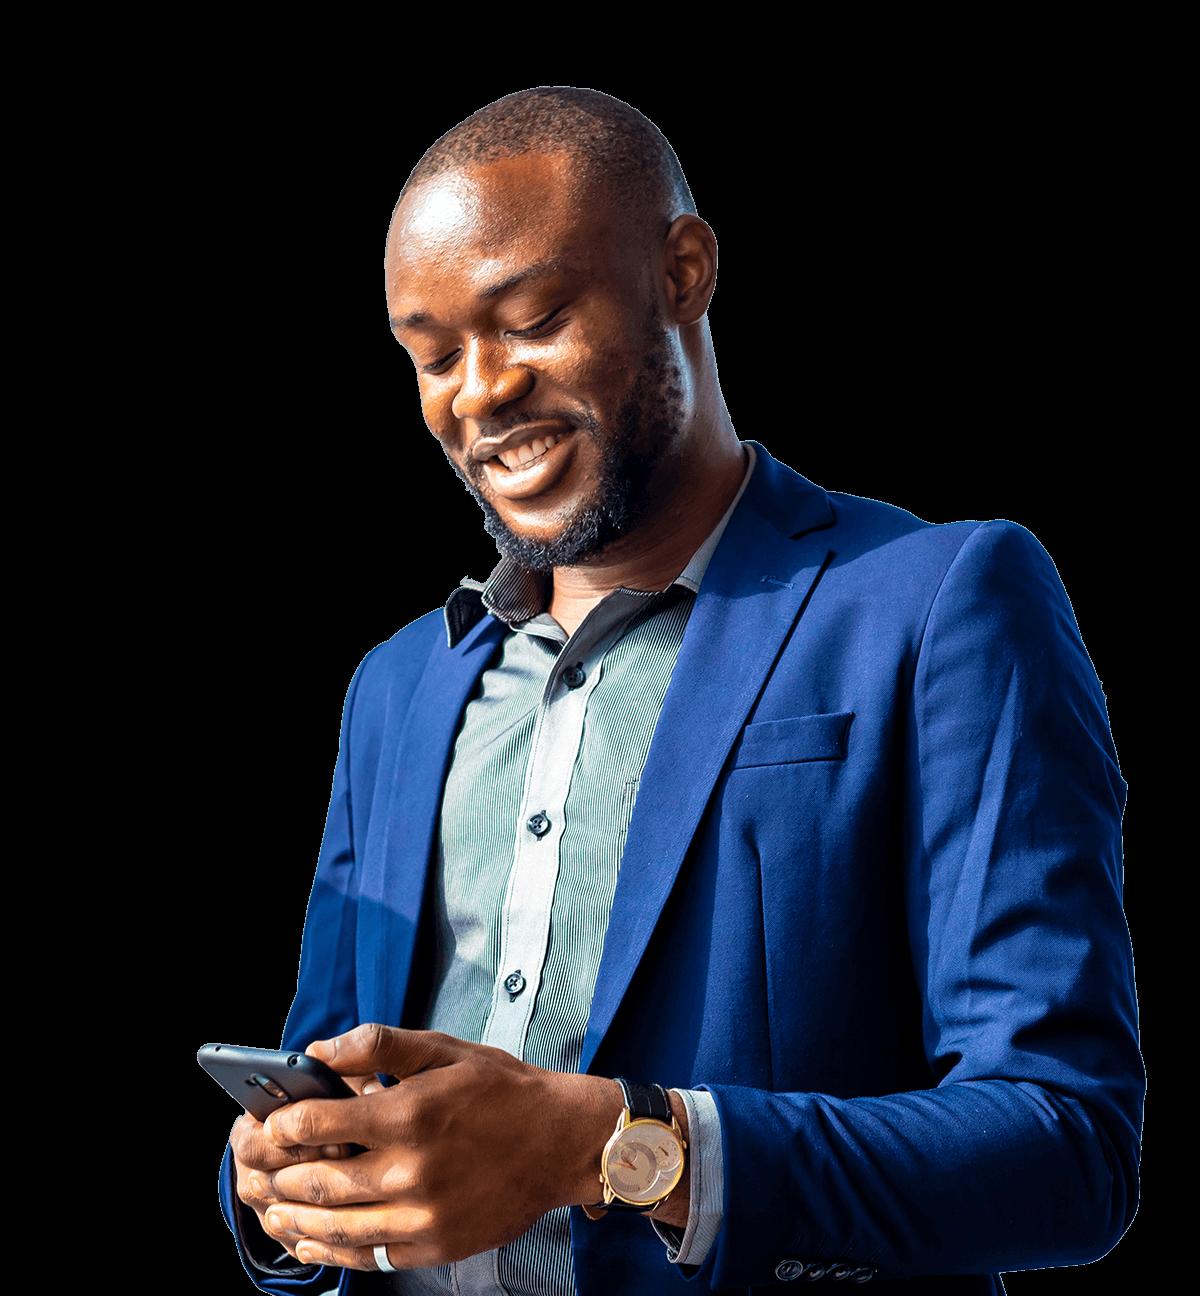 Happy man with phone